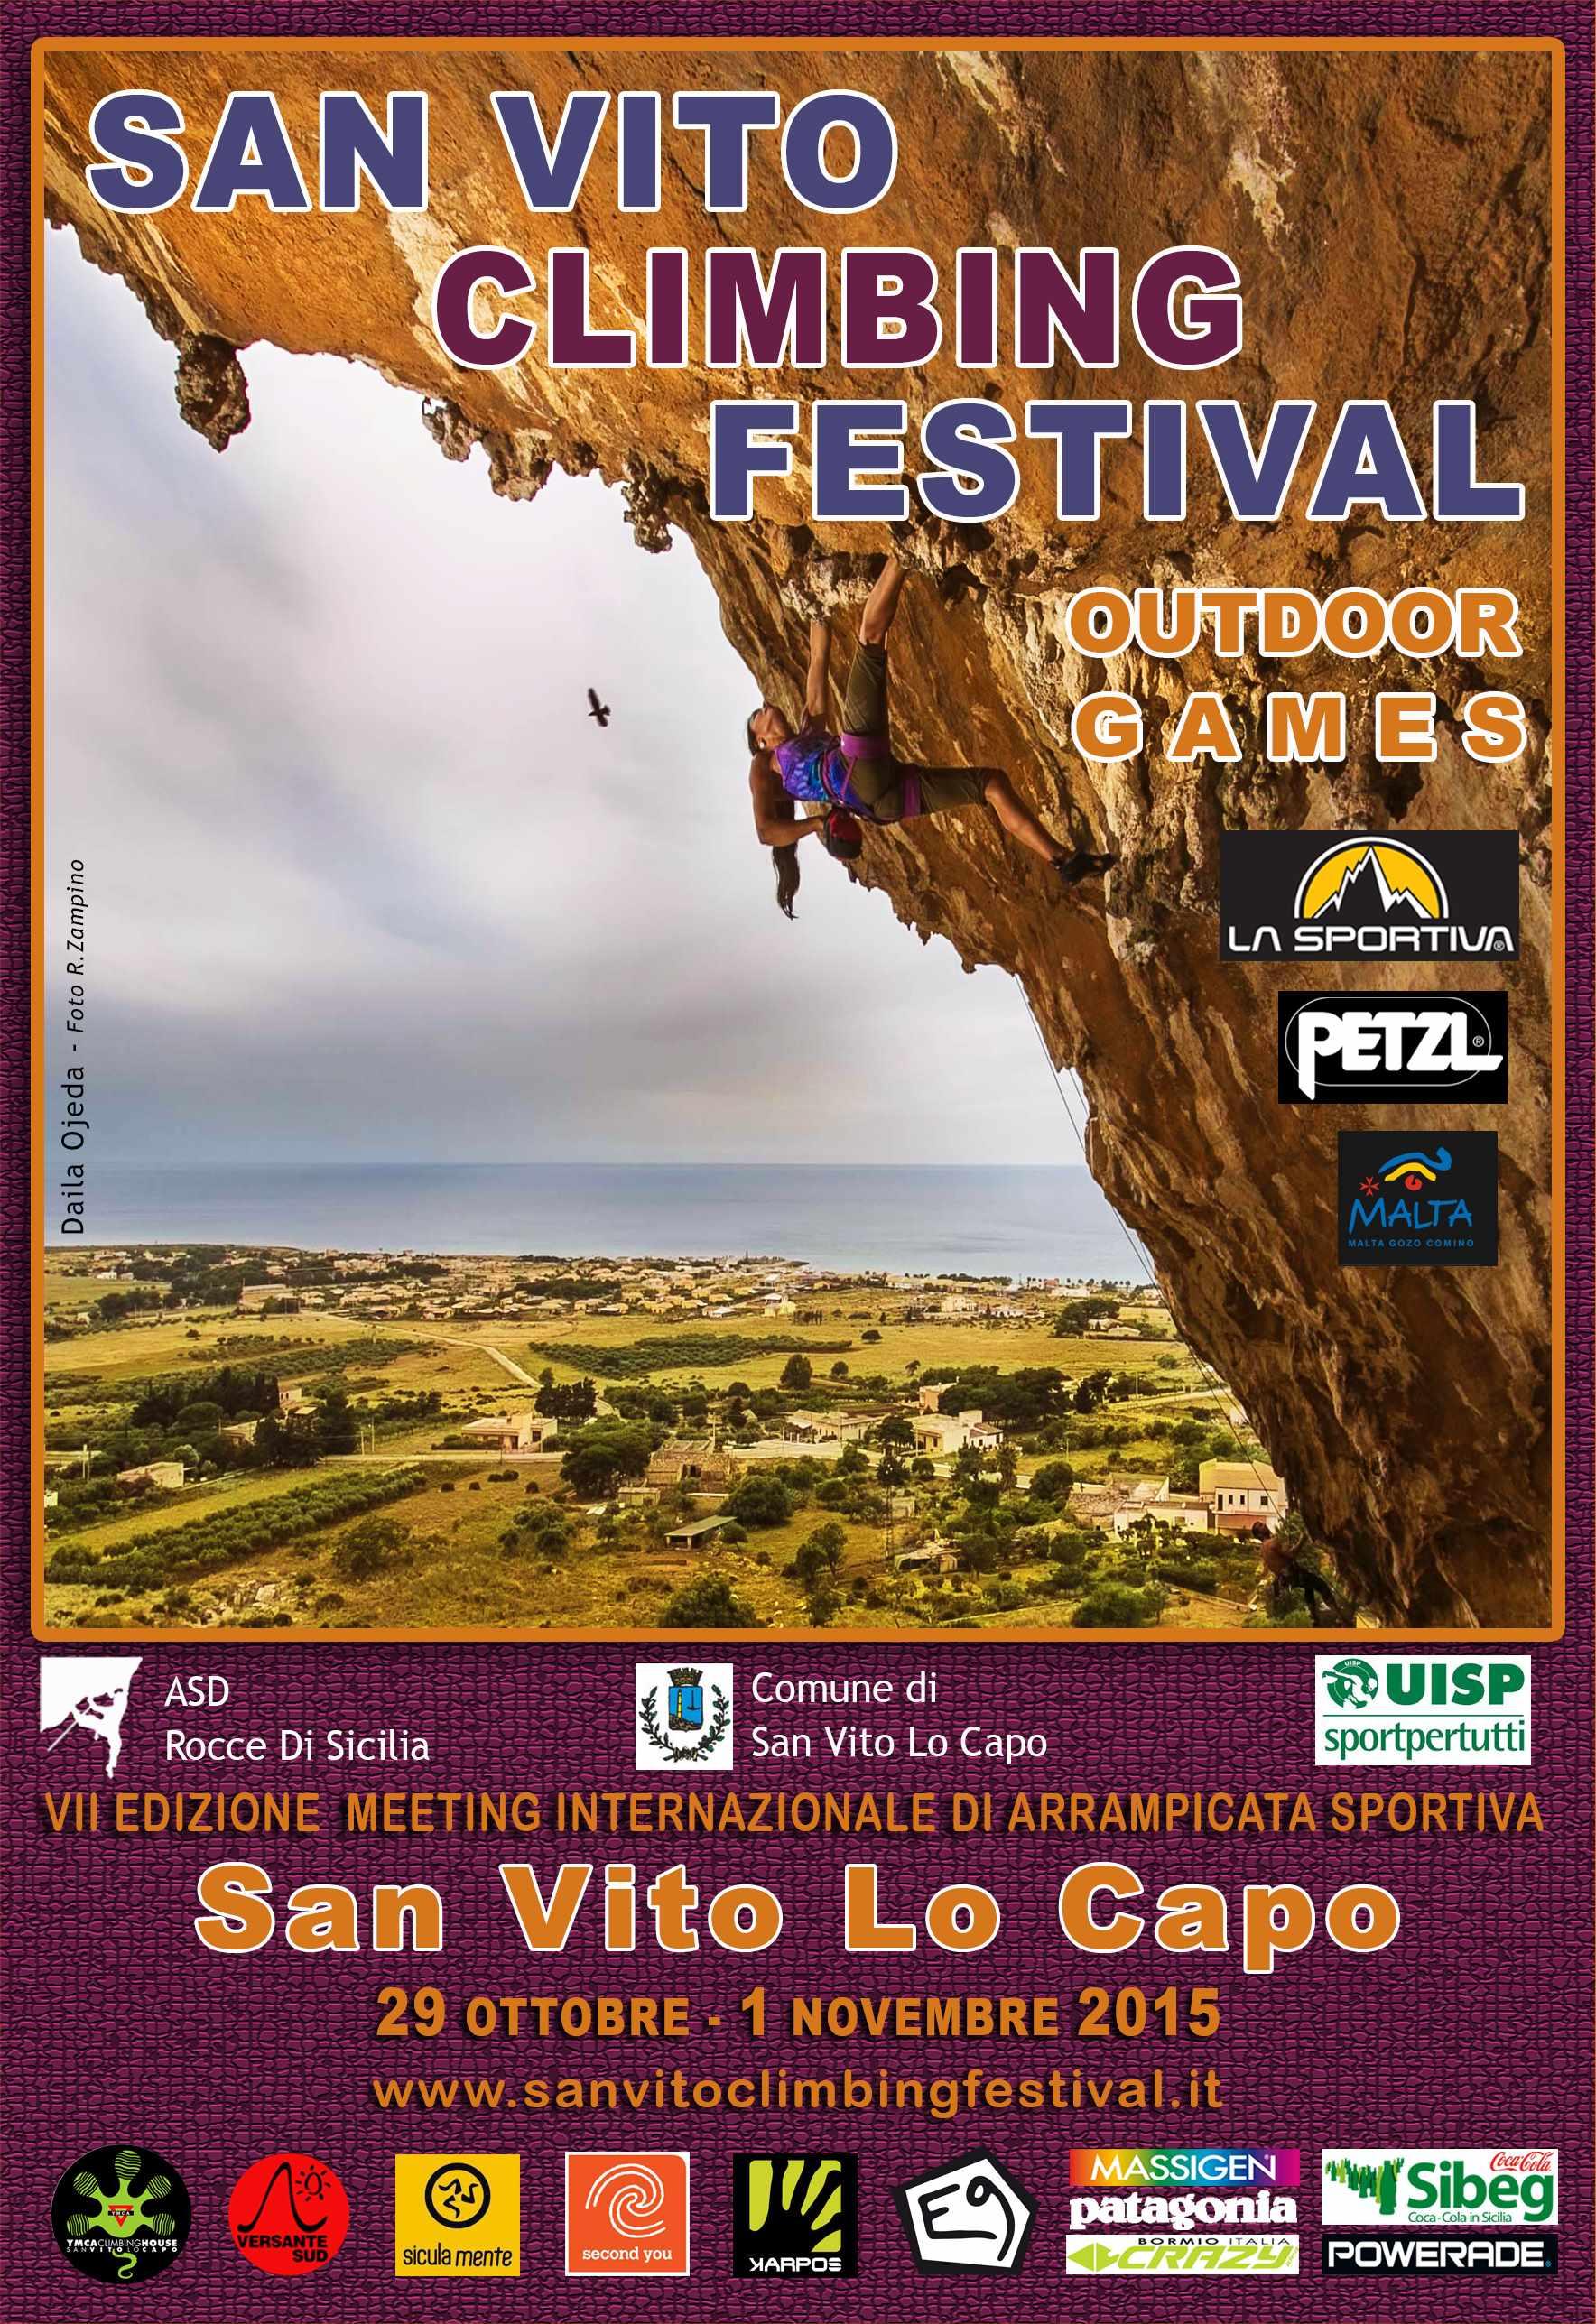 San Vito Climbing - Hotel Trinacria